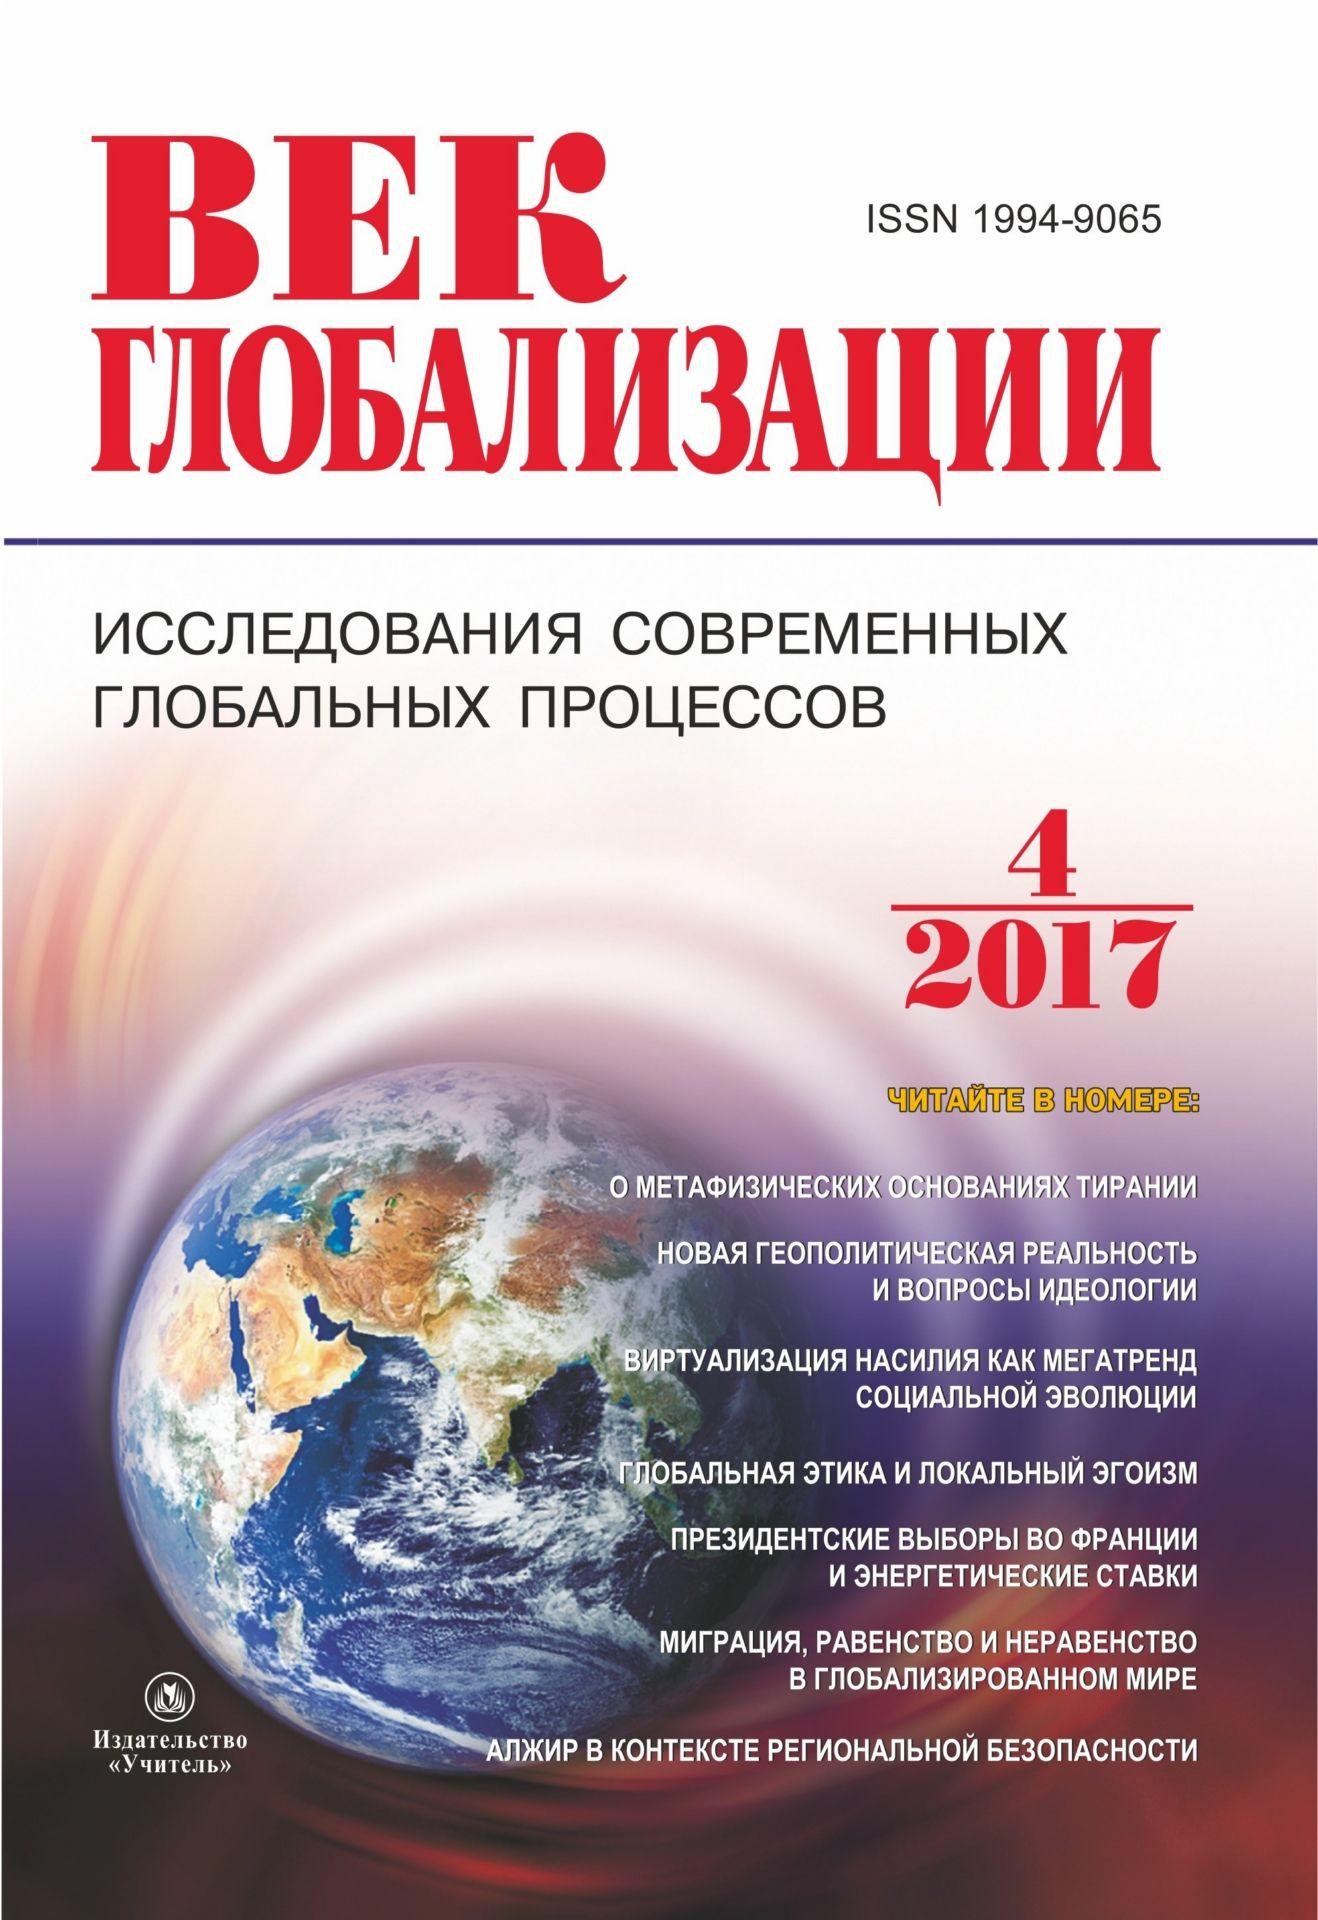 Журнал Век глобализации № 4 2017